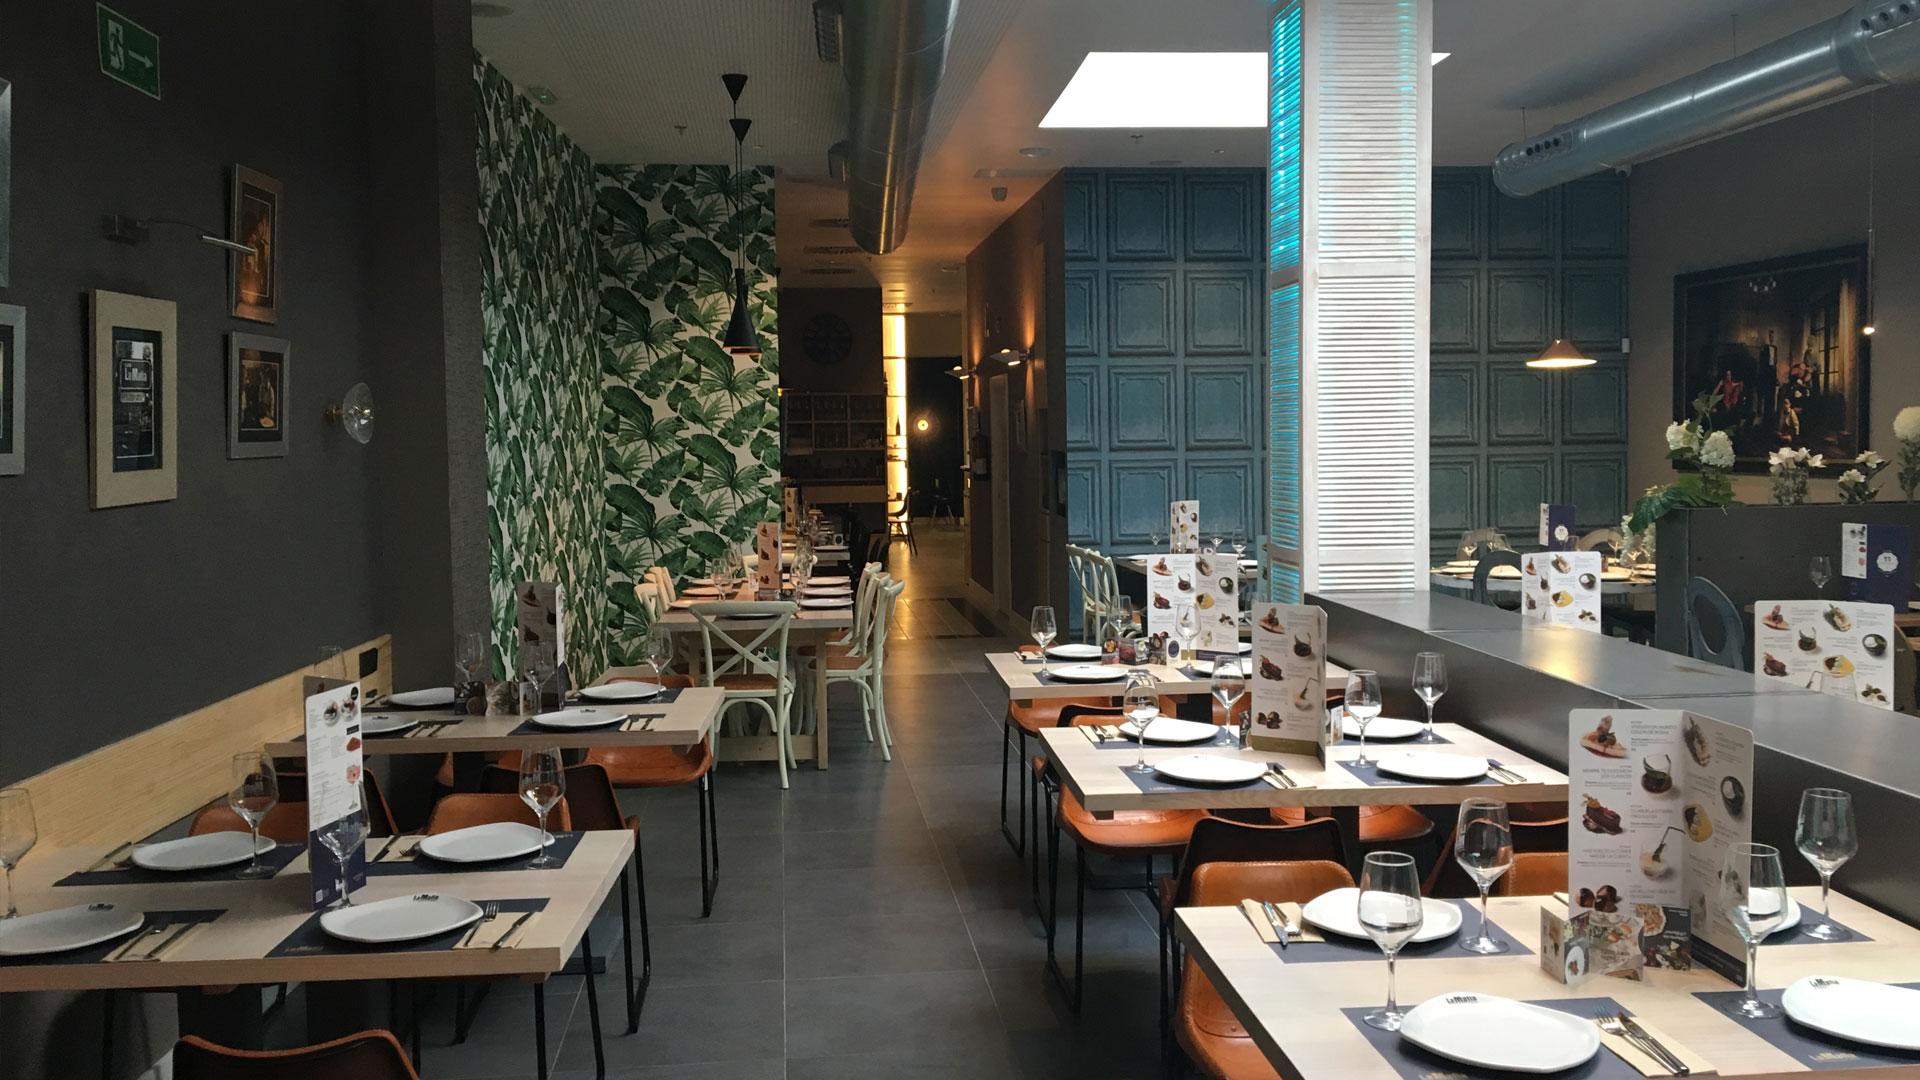 valencia_centro-restaurante-italiano-mediterraneo-moda